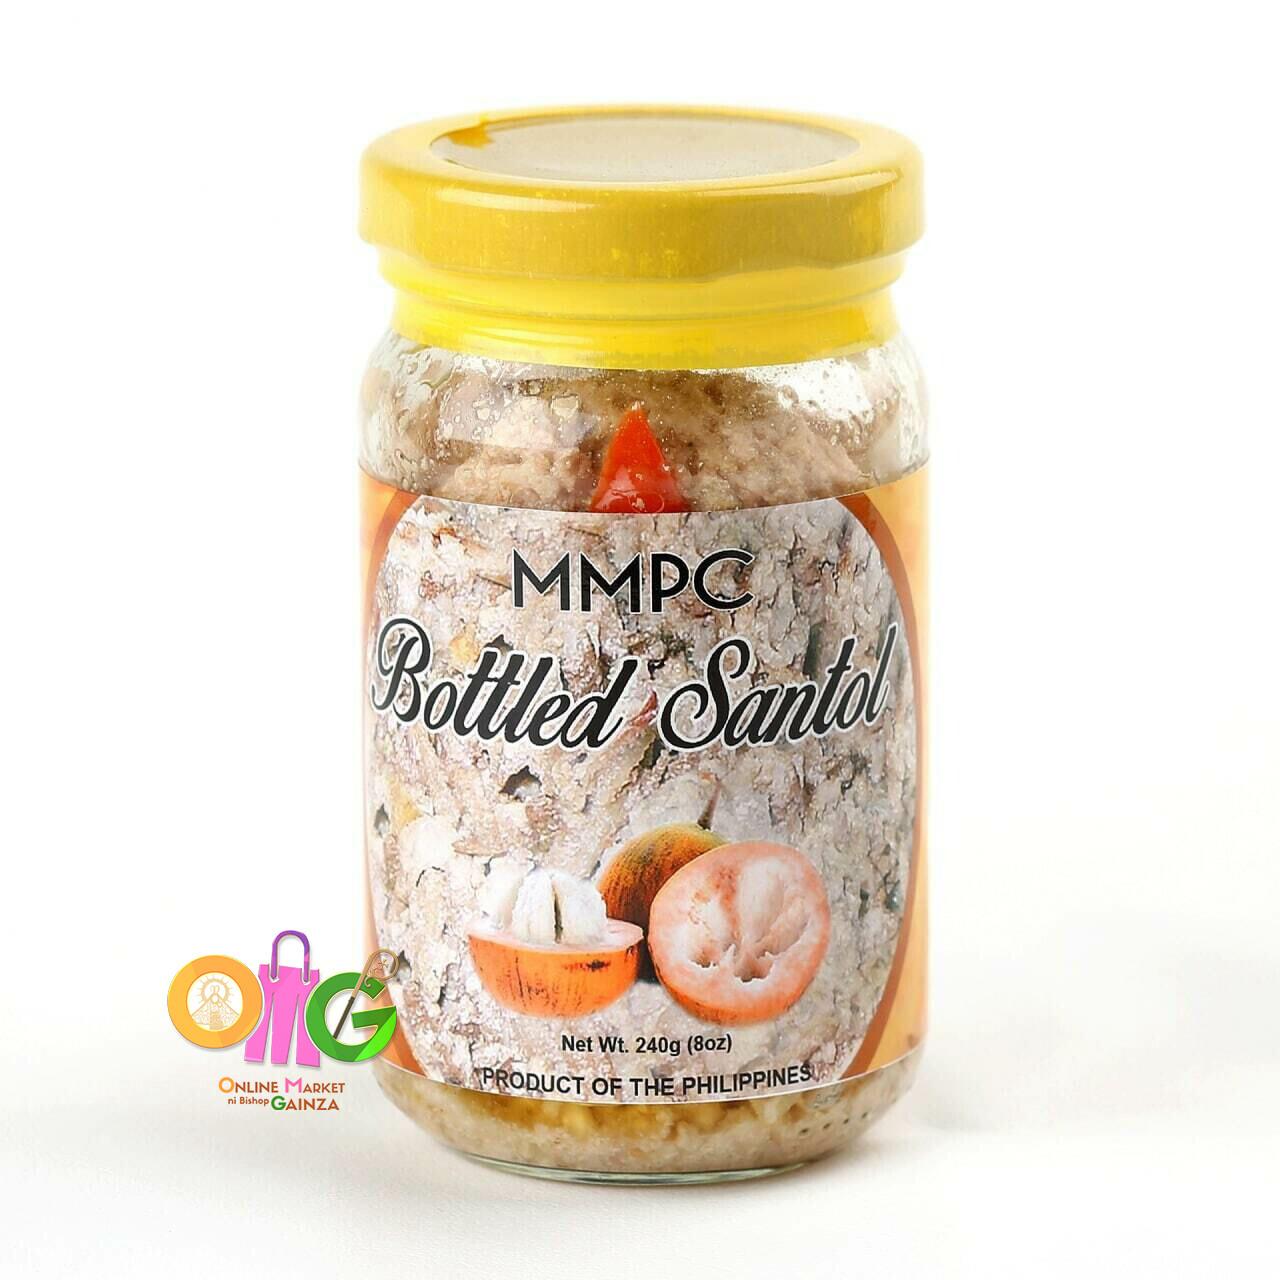 Matacla Multi Purpose Cooperative (MMPC) - Bottled Santol